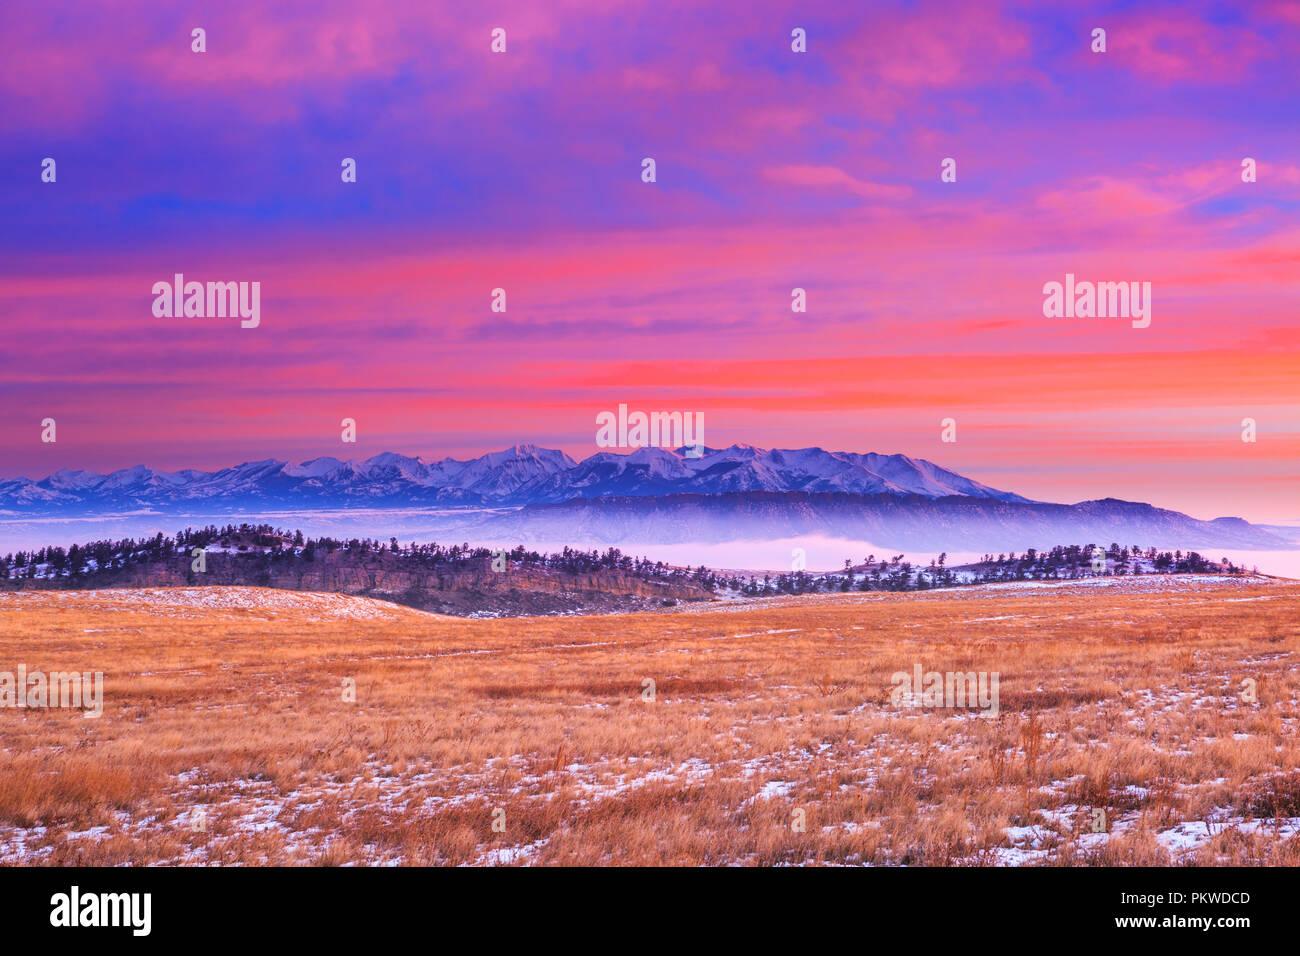 sunrise sky over the crazy mountains and sheep mountain near livingston, montana - Stock Image